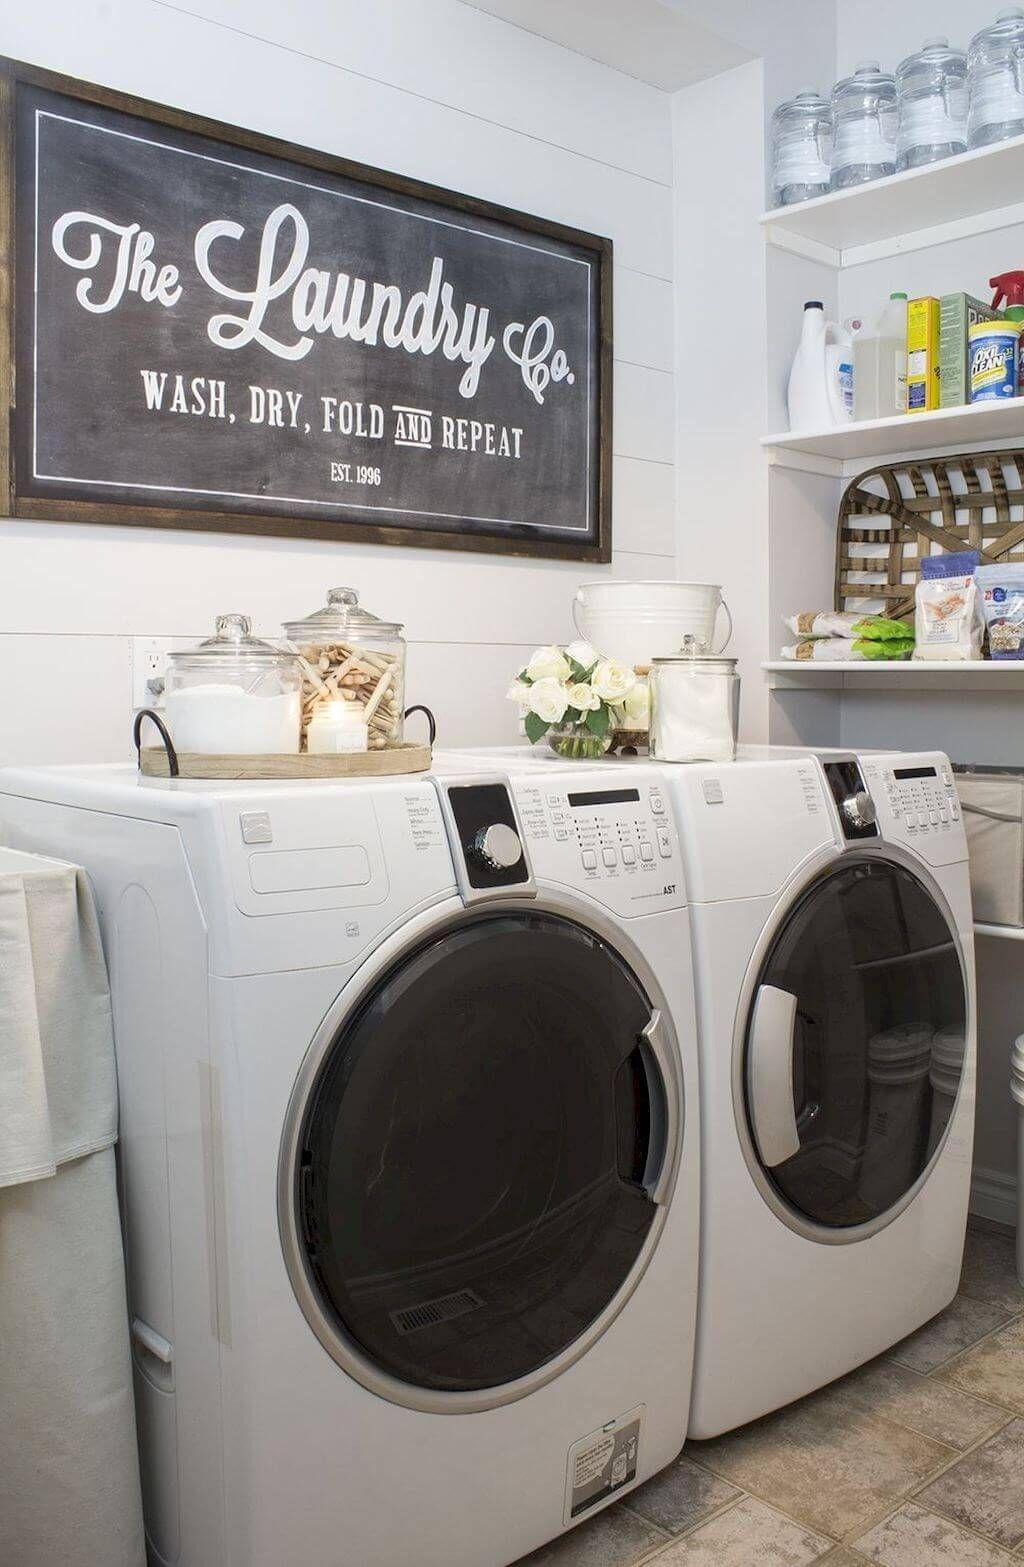 34 Farmhouse Laundry Room Ideas to Organize